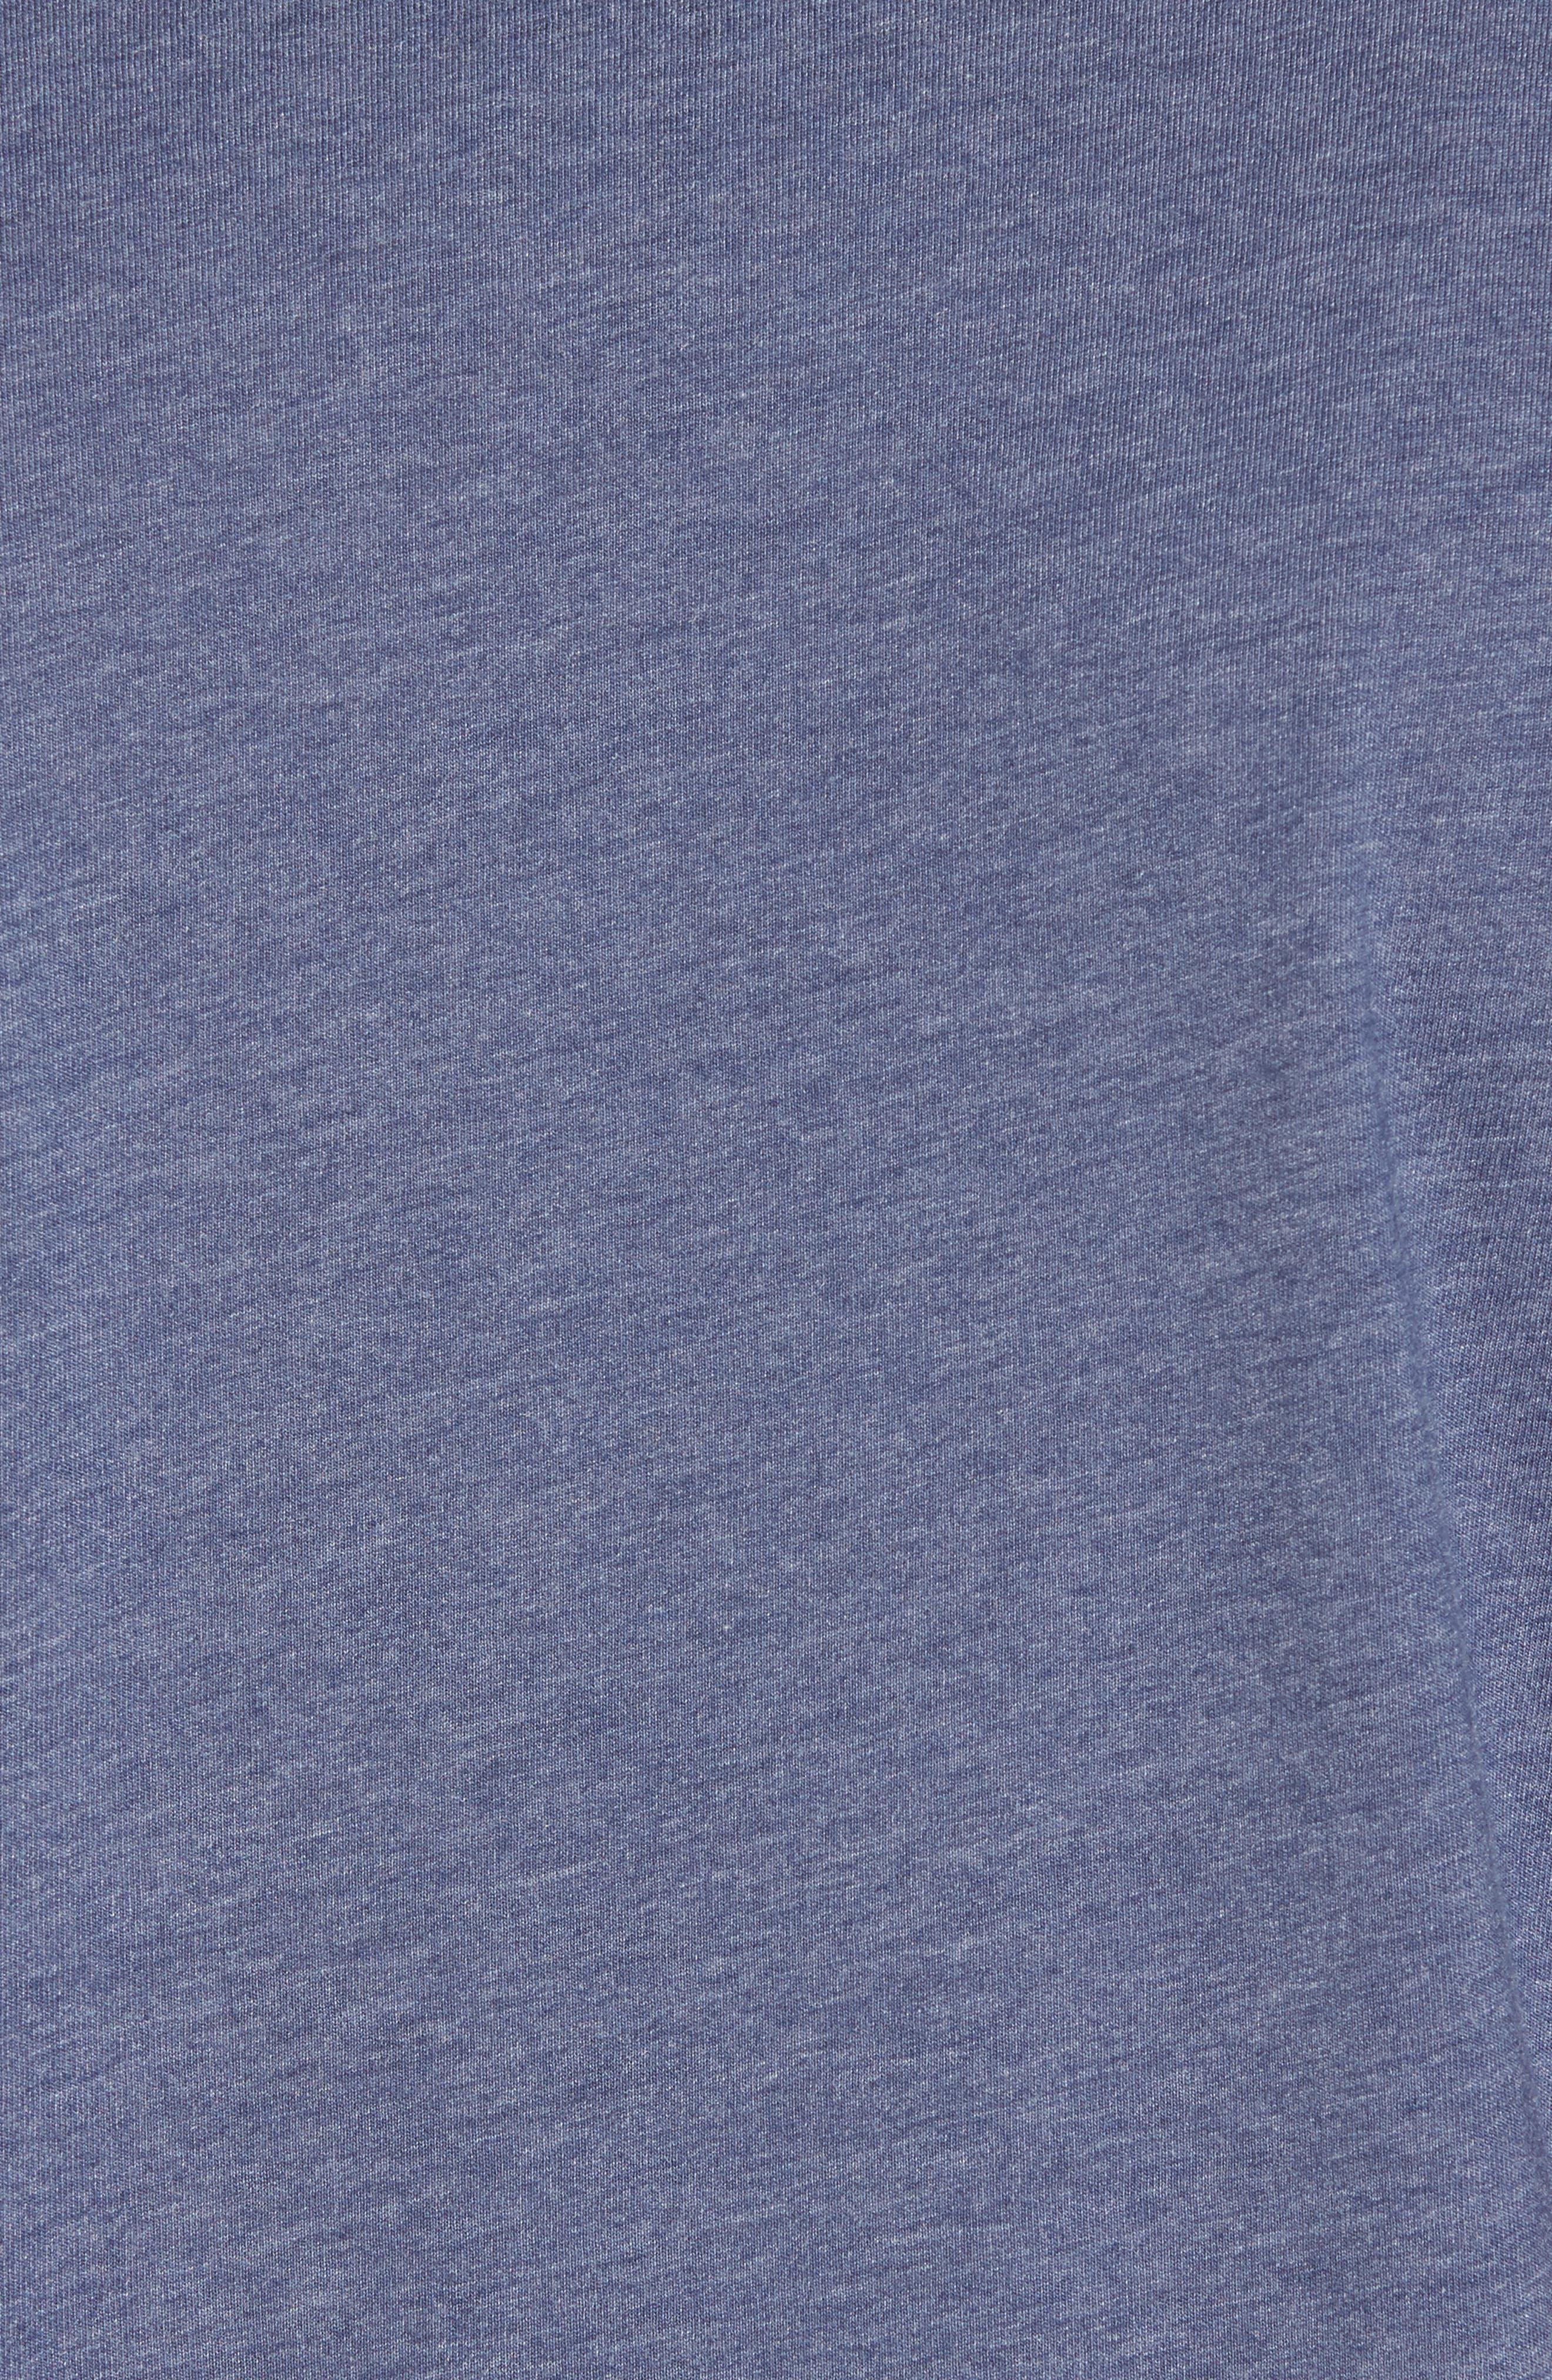 Drebo Graphic T-Shirt,                             Alternate thumbnail 5, color,                             Heather Blue Nights